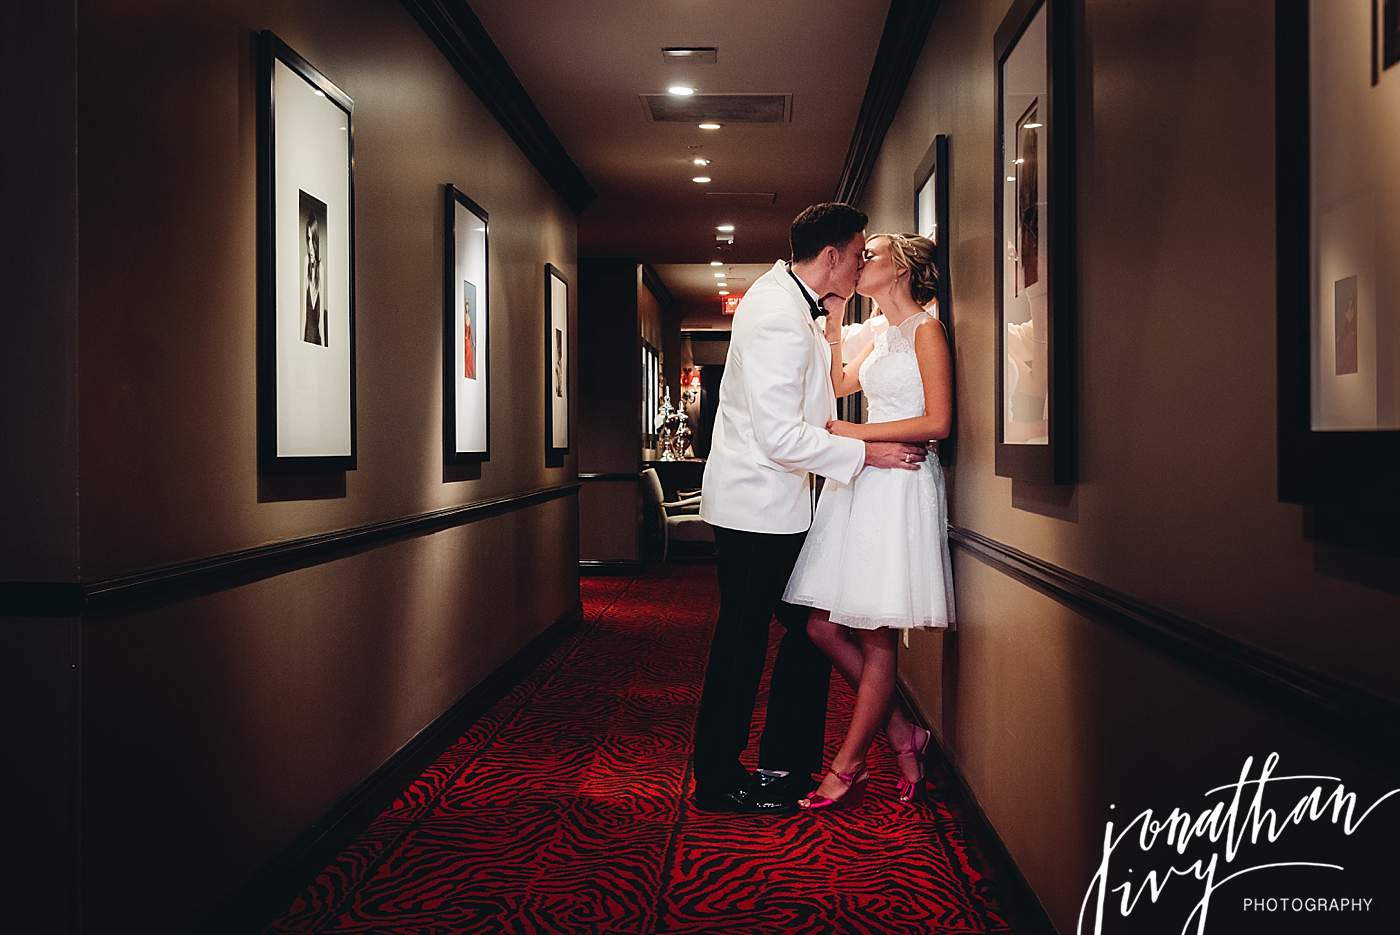 Hotel Zaza Houston Wedding,Hotel Zaza Wedding,Houston Wedding Photographer,The Woodlands Wedding Photographer,Wedding at Hotel Zaza,